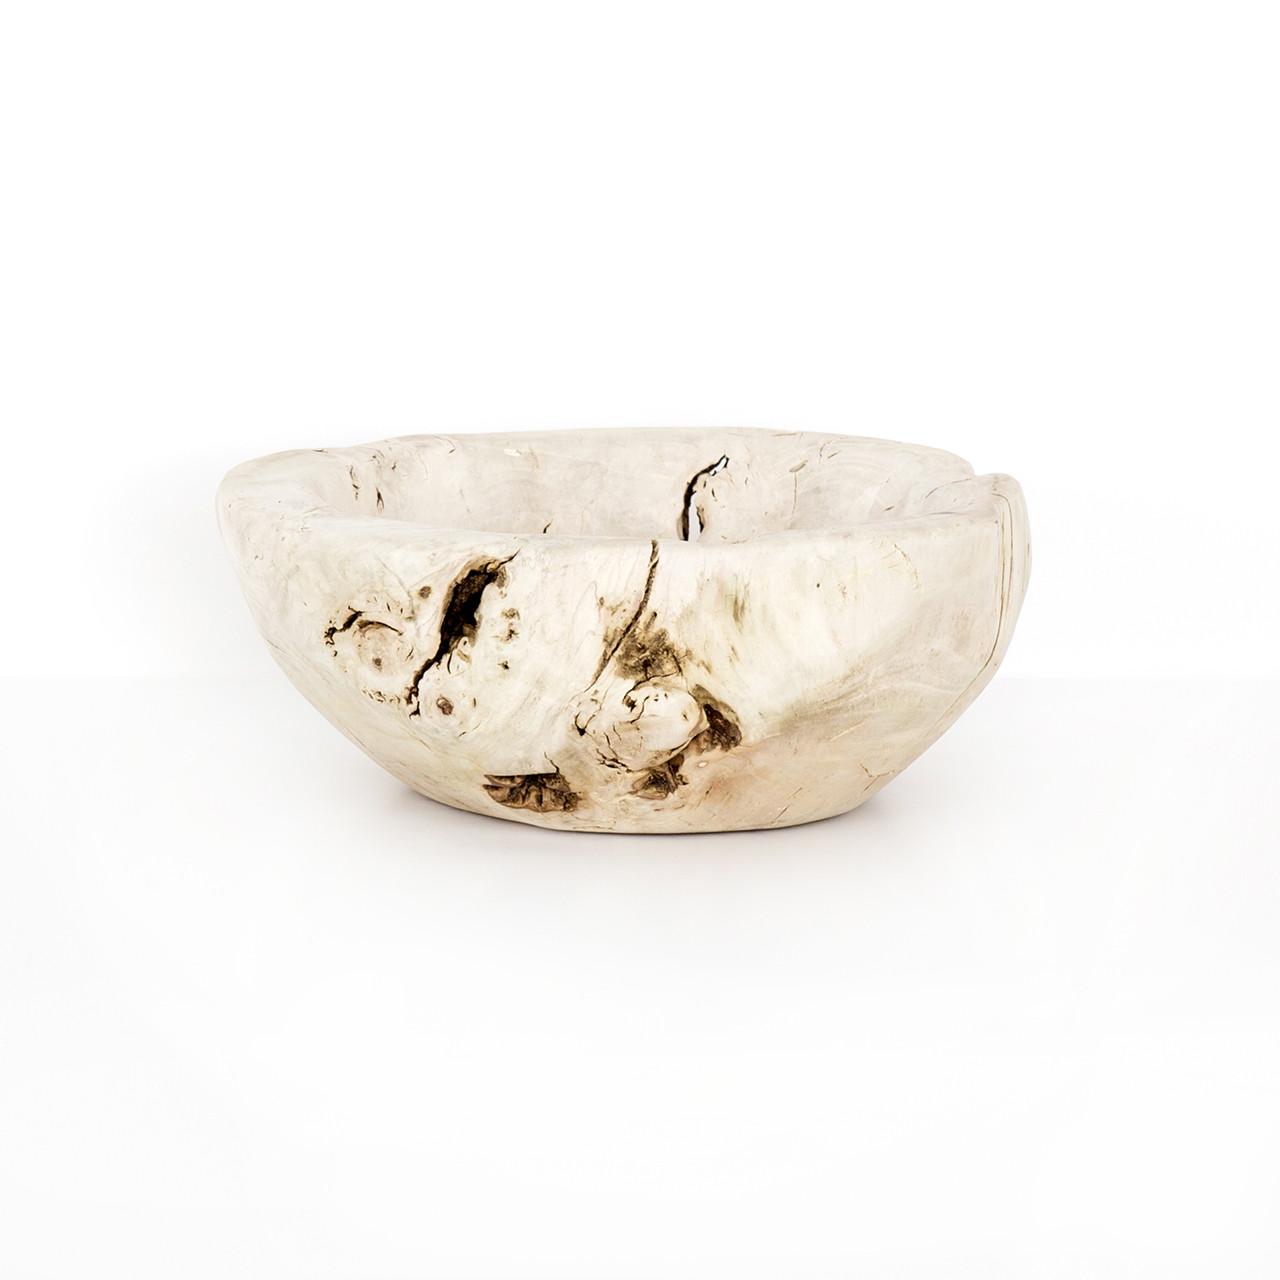 Reclaimed Wood Bowl - Ivory